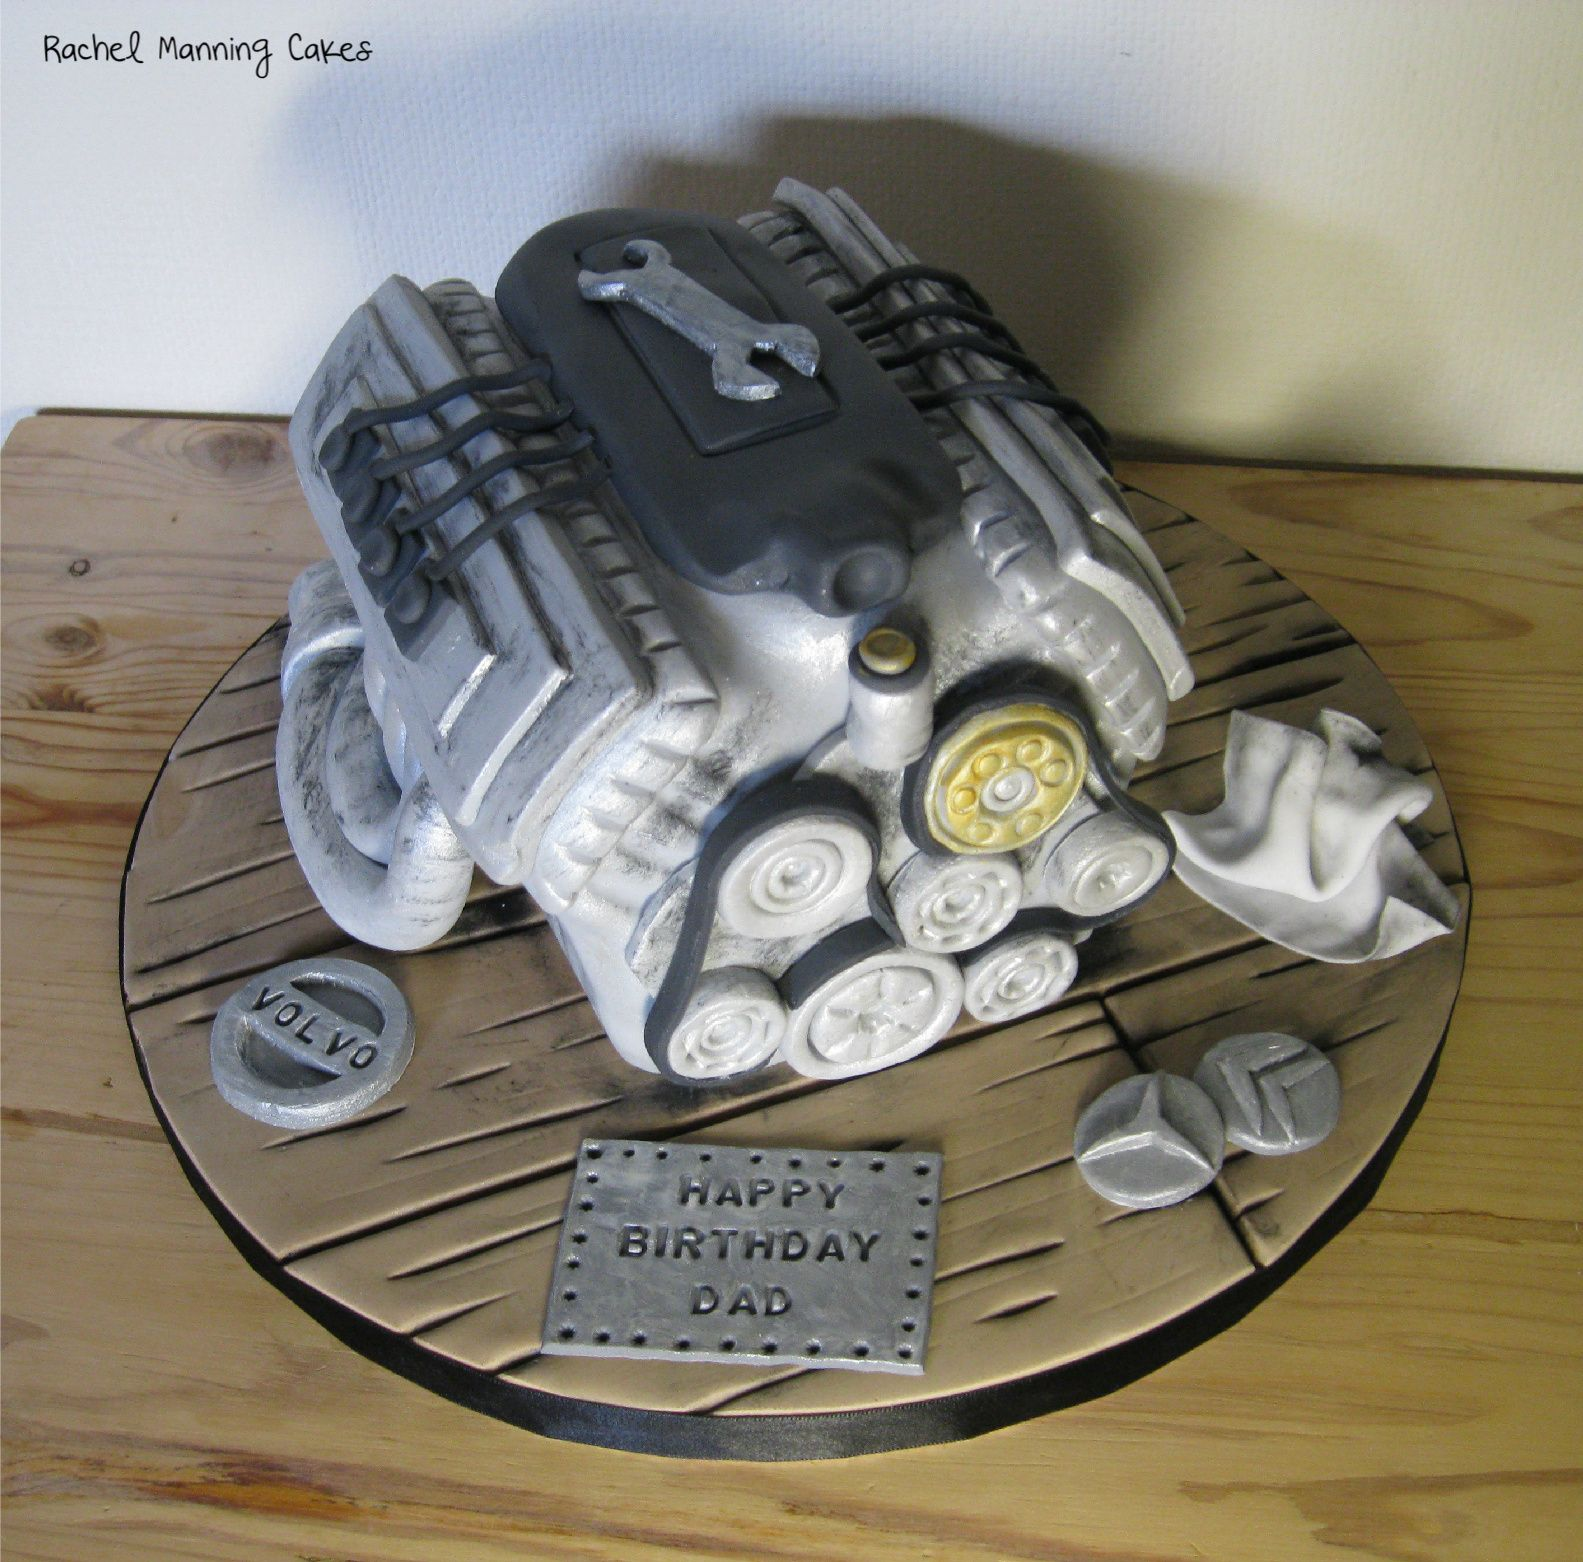 Car Engine Cake Cakes Pinterest Car engine Engine and Cake